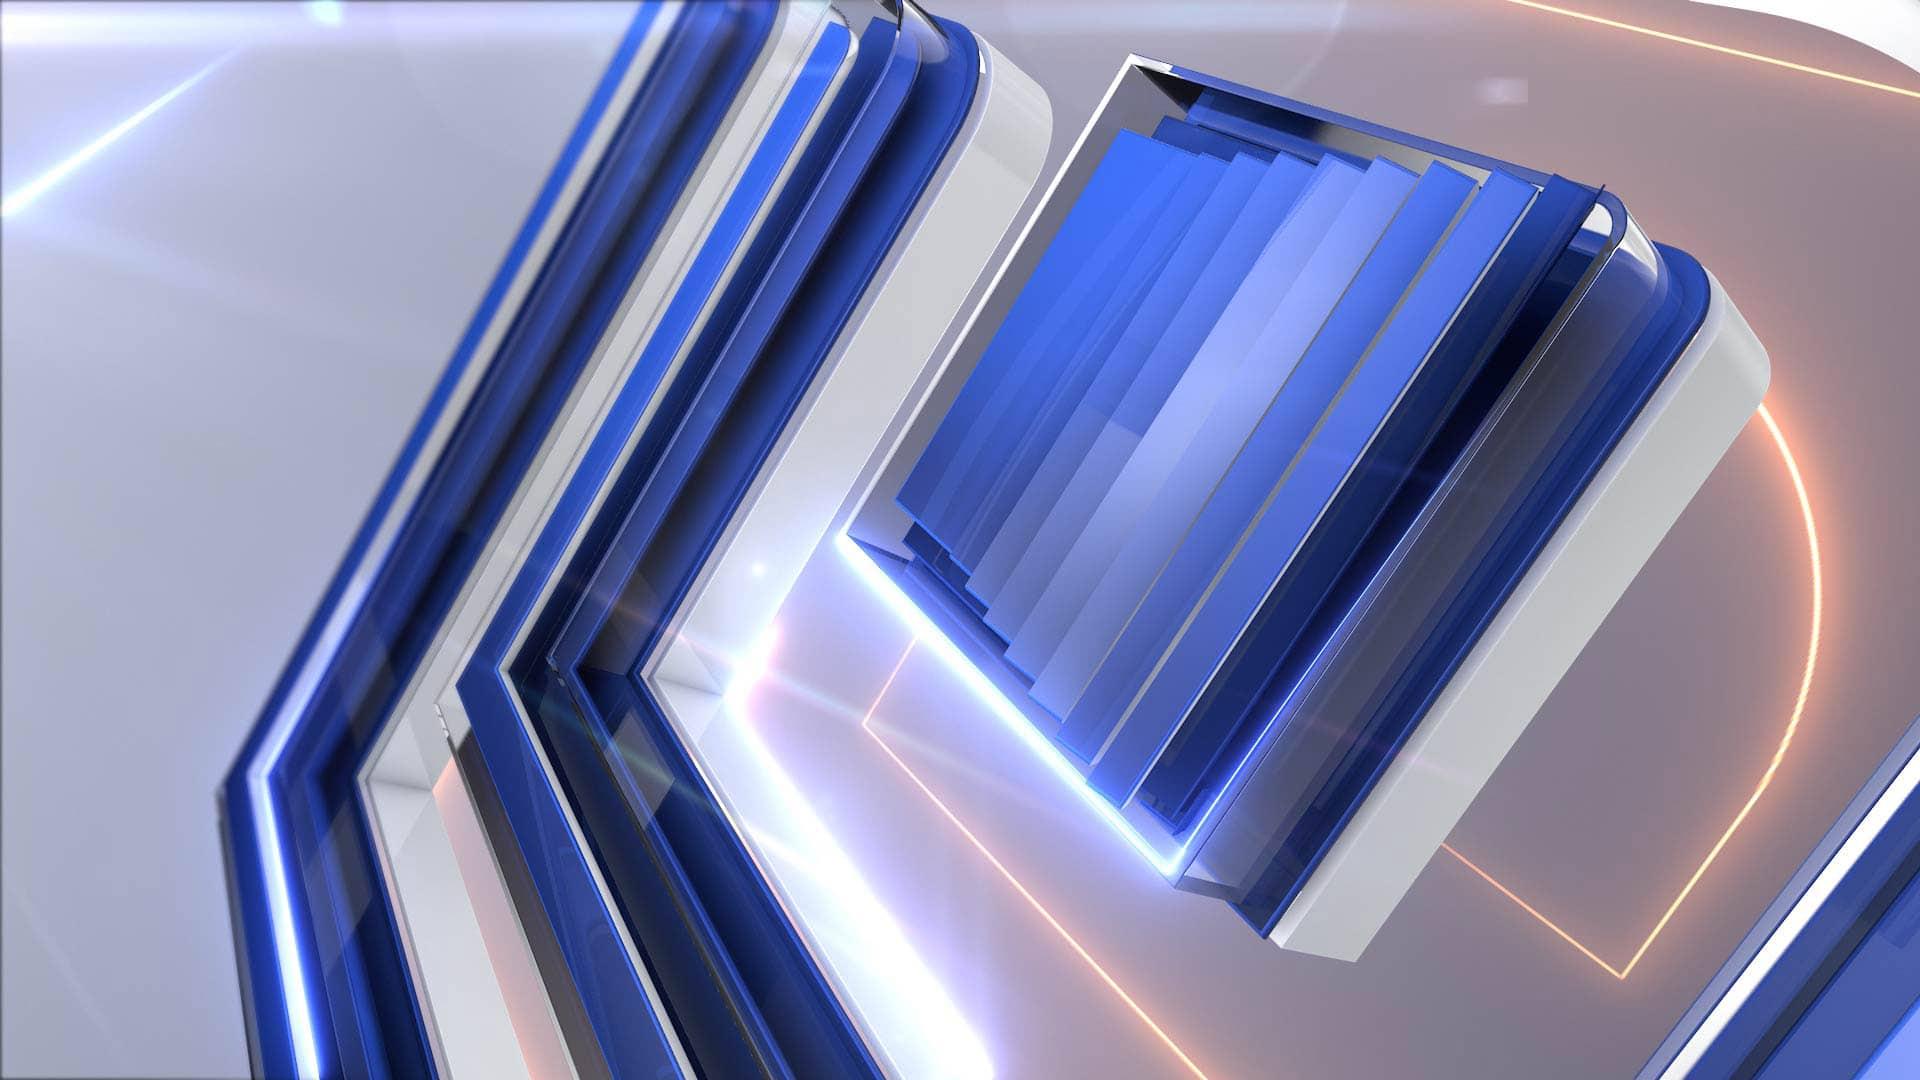 2019 Liaoning News Concept Opener Stills 02 Girraphic